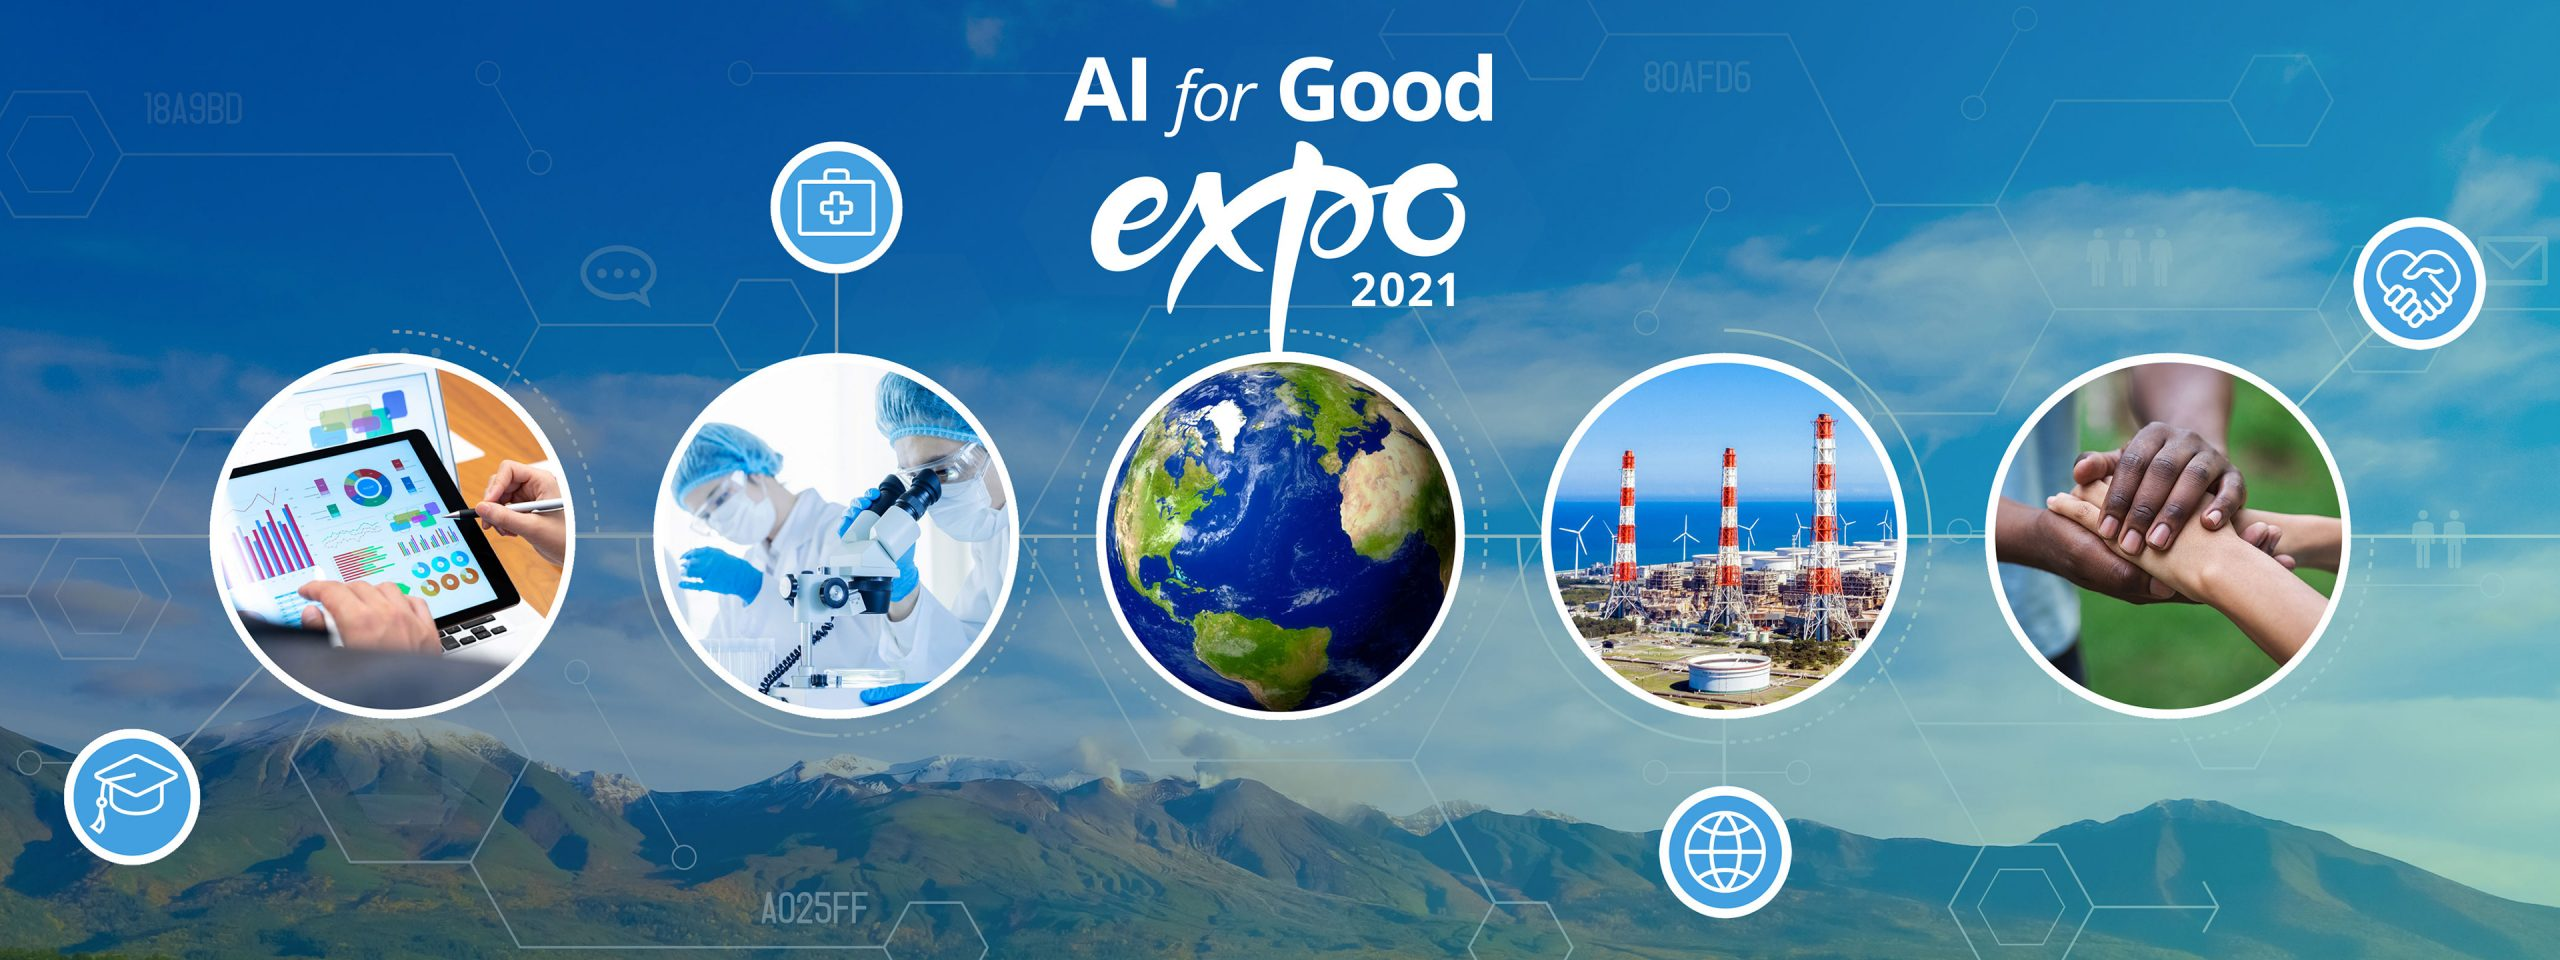 AI for Good Expo 2021